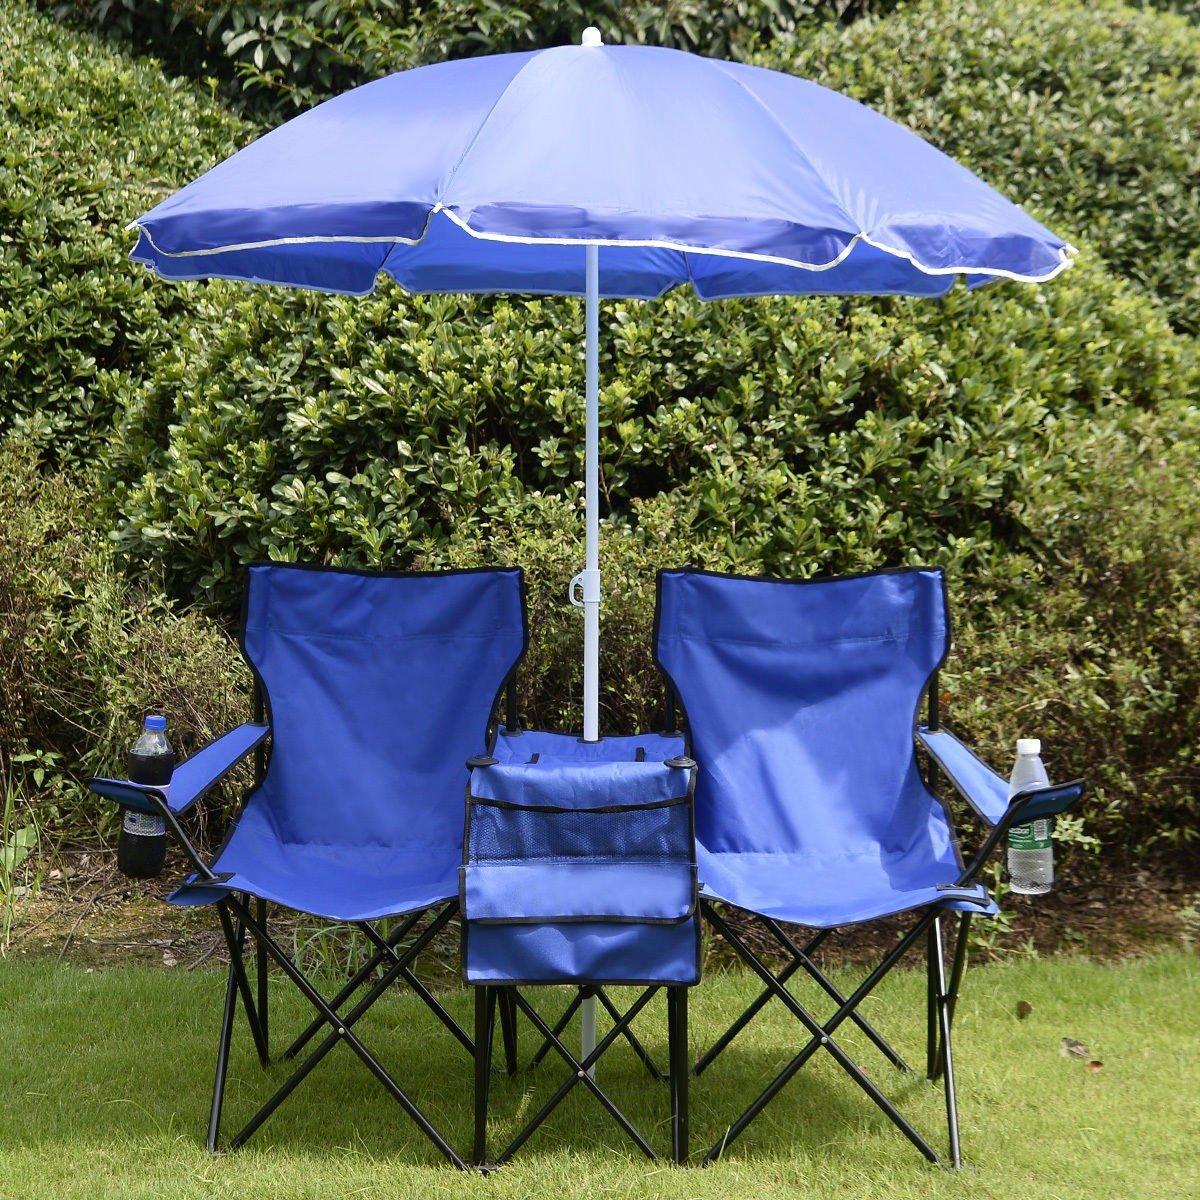 Washington Mall Mali Shop Portable Picnic lowest price Folding W Umbrella Table Chair Double